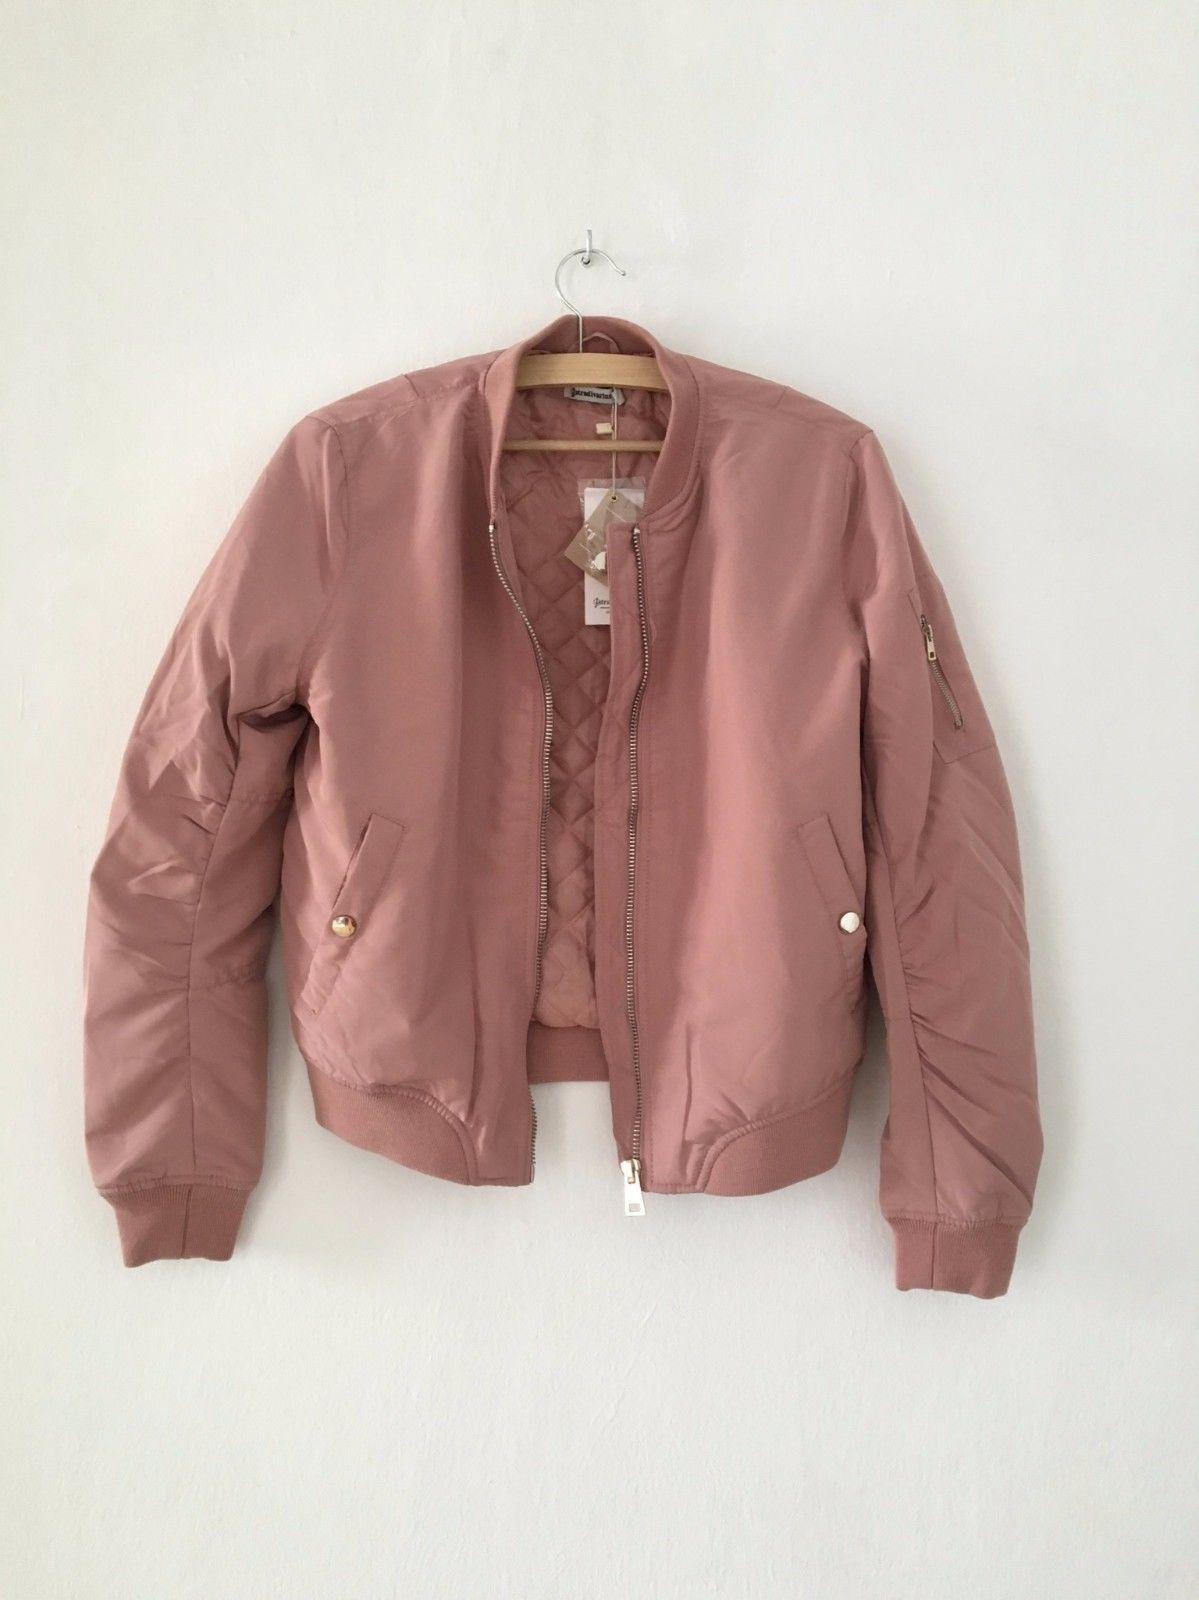 b75fee93c20 Stradivarius Bomber jacket PALE PINK S